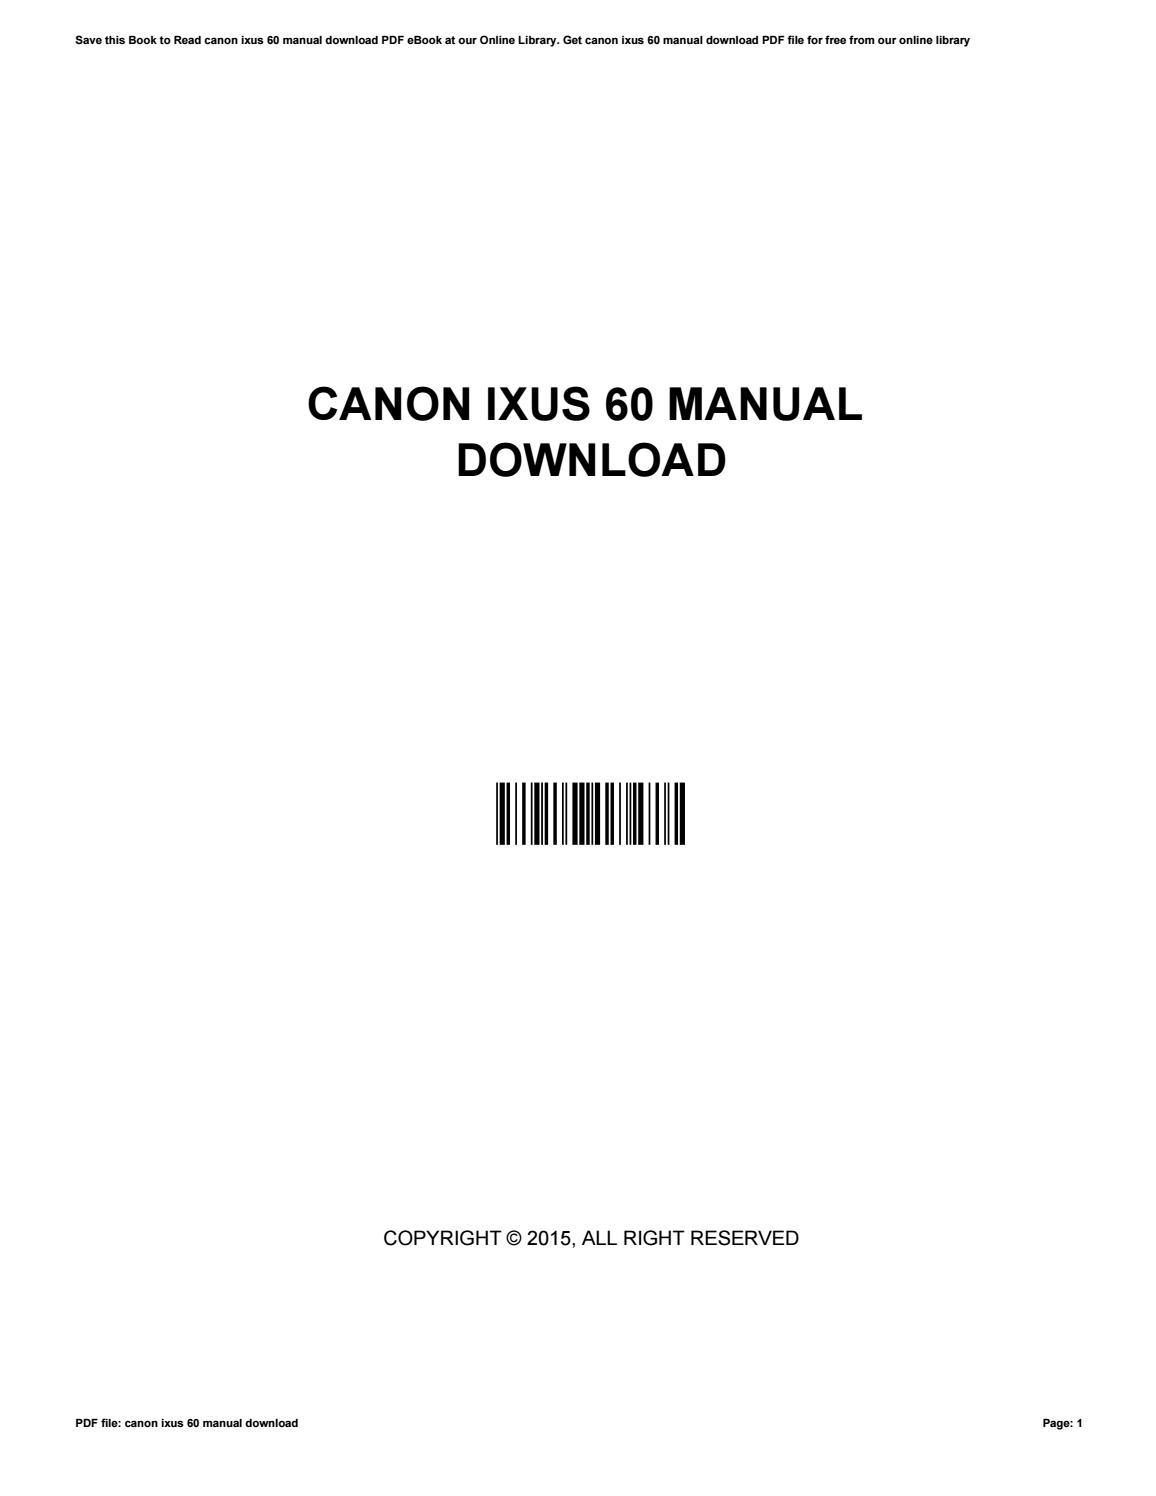 Canon digital ixus 60 review.